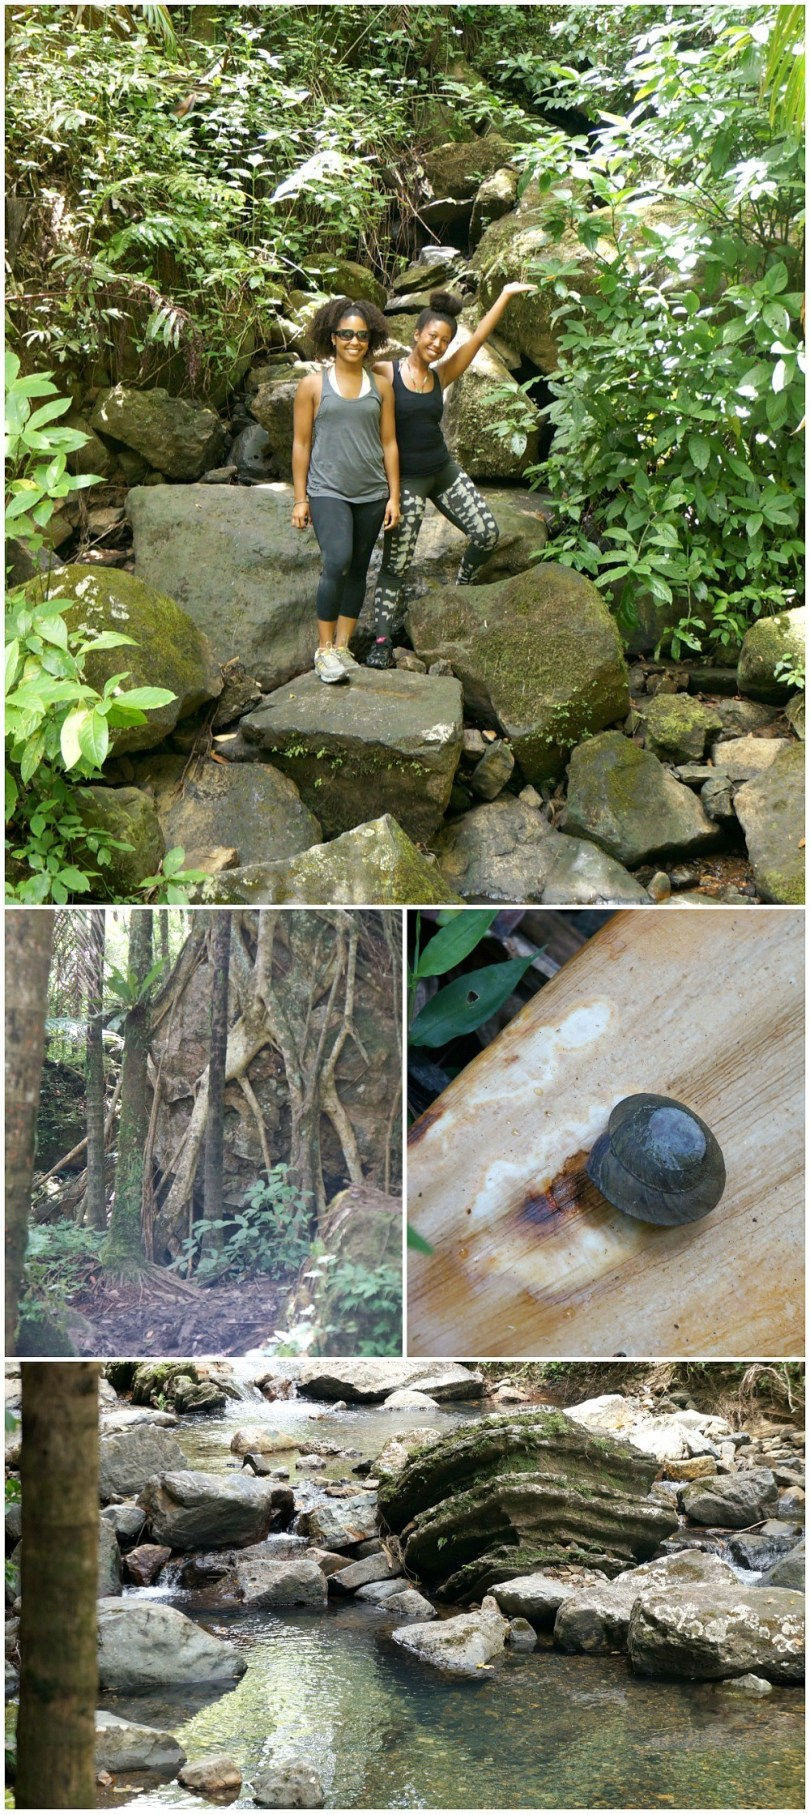 Hiking La Mina Falls trail in El Yunque Rainforest, Puerto Rico